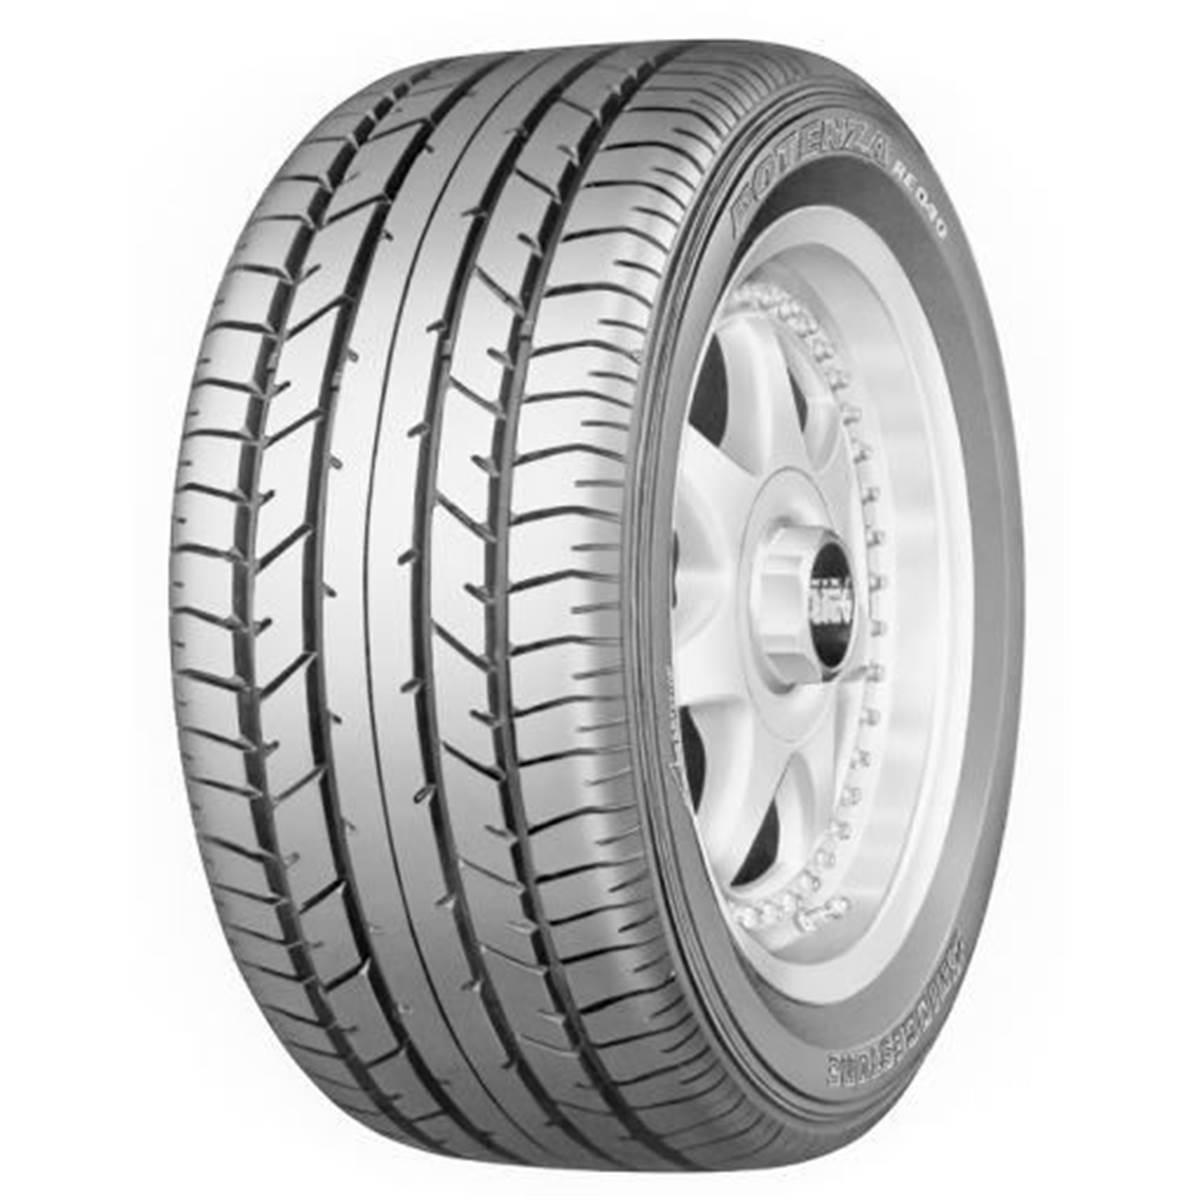 Pneu Bridgestone 215/45R16 86W Potenza Re040